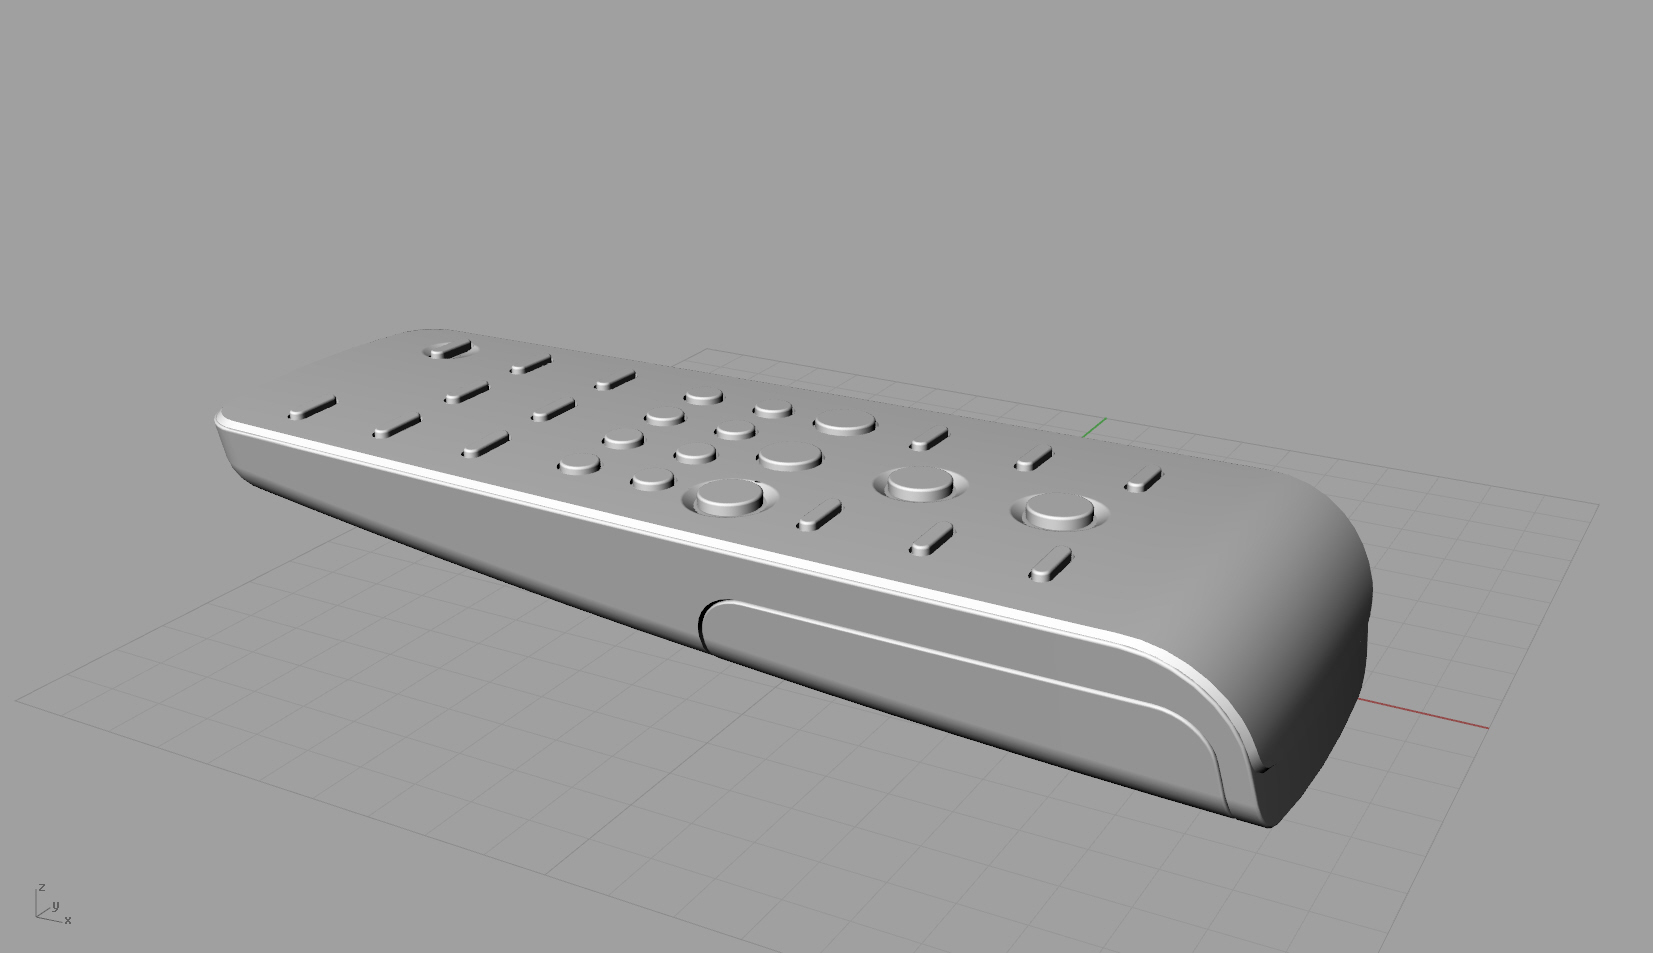 Update on new tutorials rhinoceros 3d help tutorials links light bulb tutorial remote controller tutorial baditri Choice Image